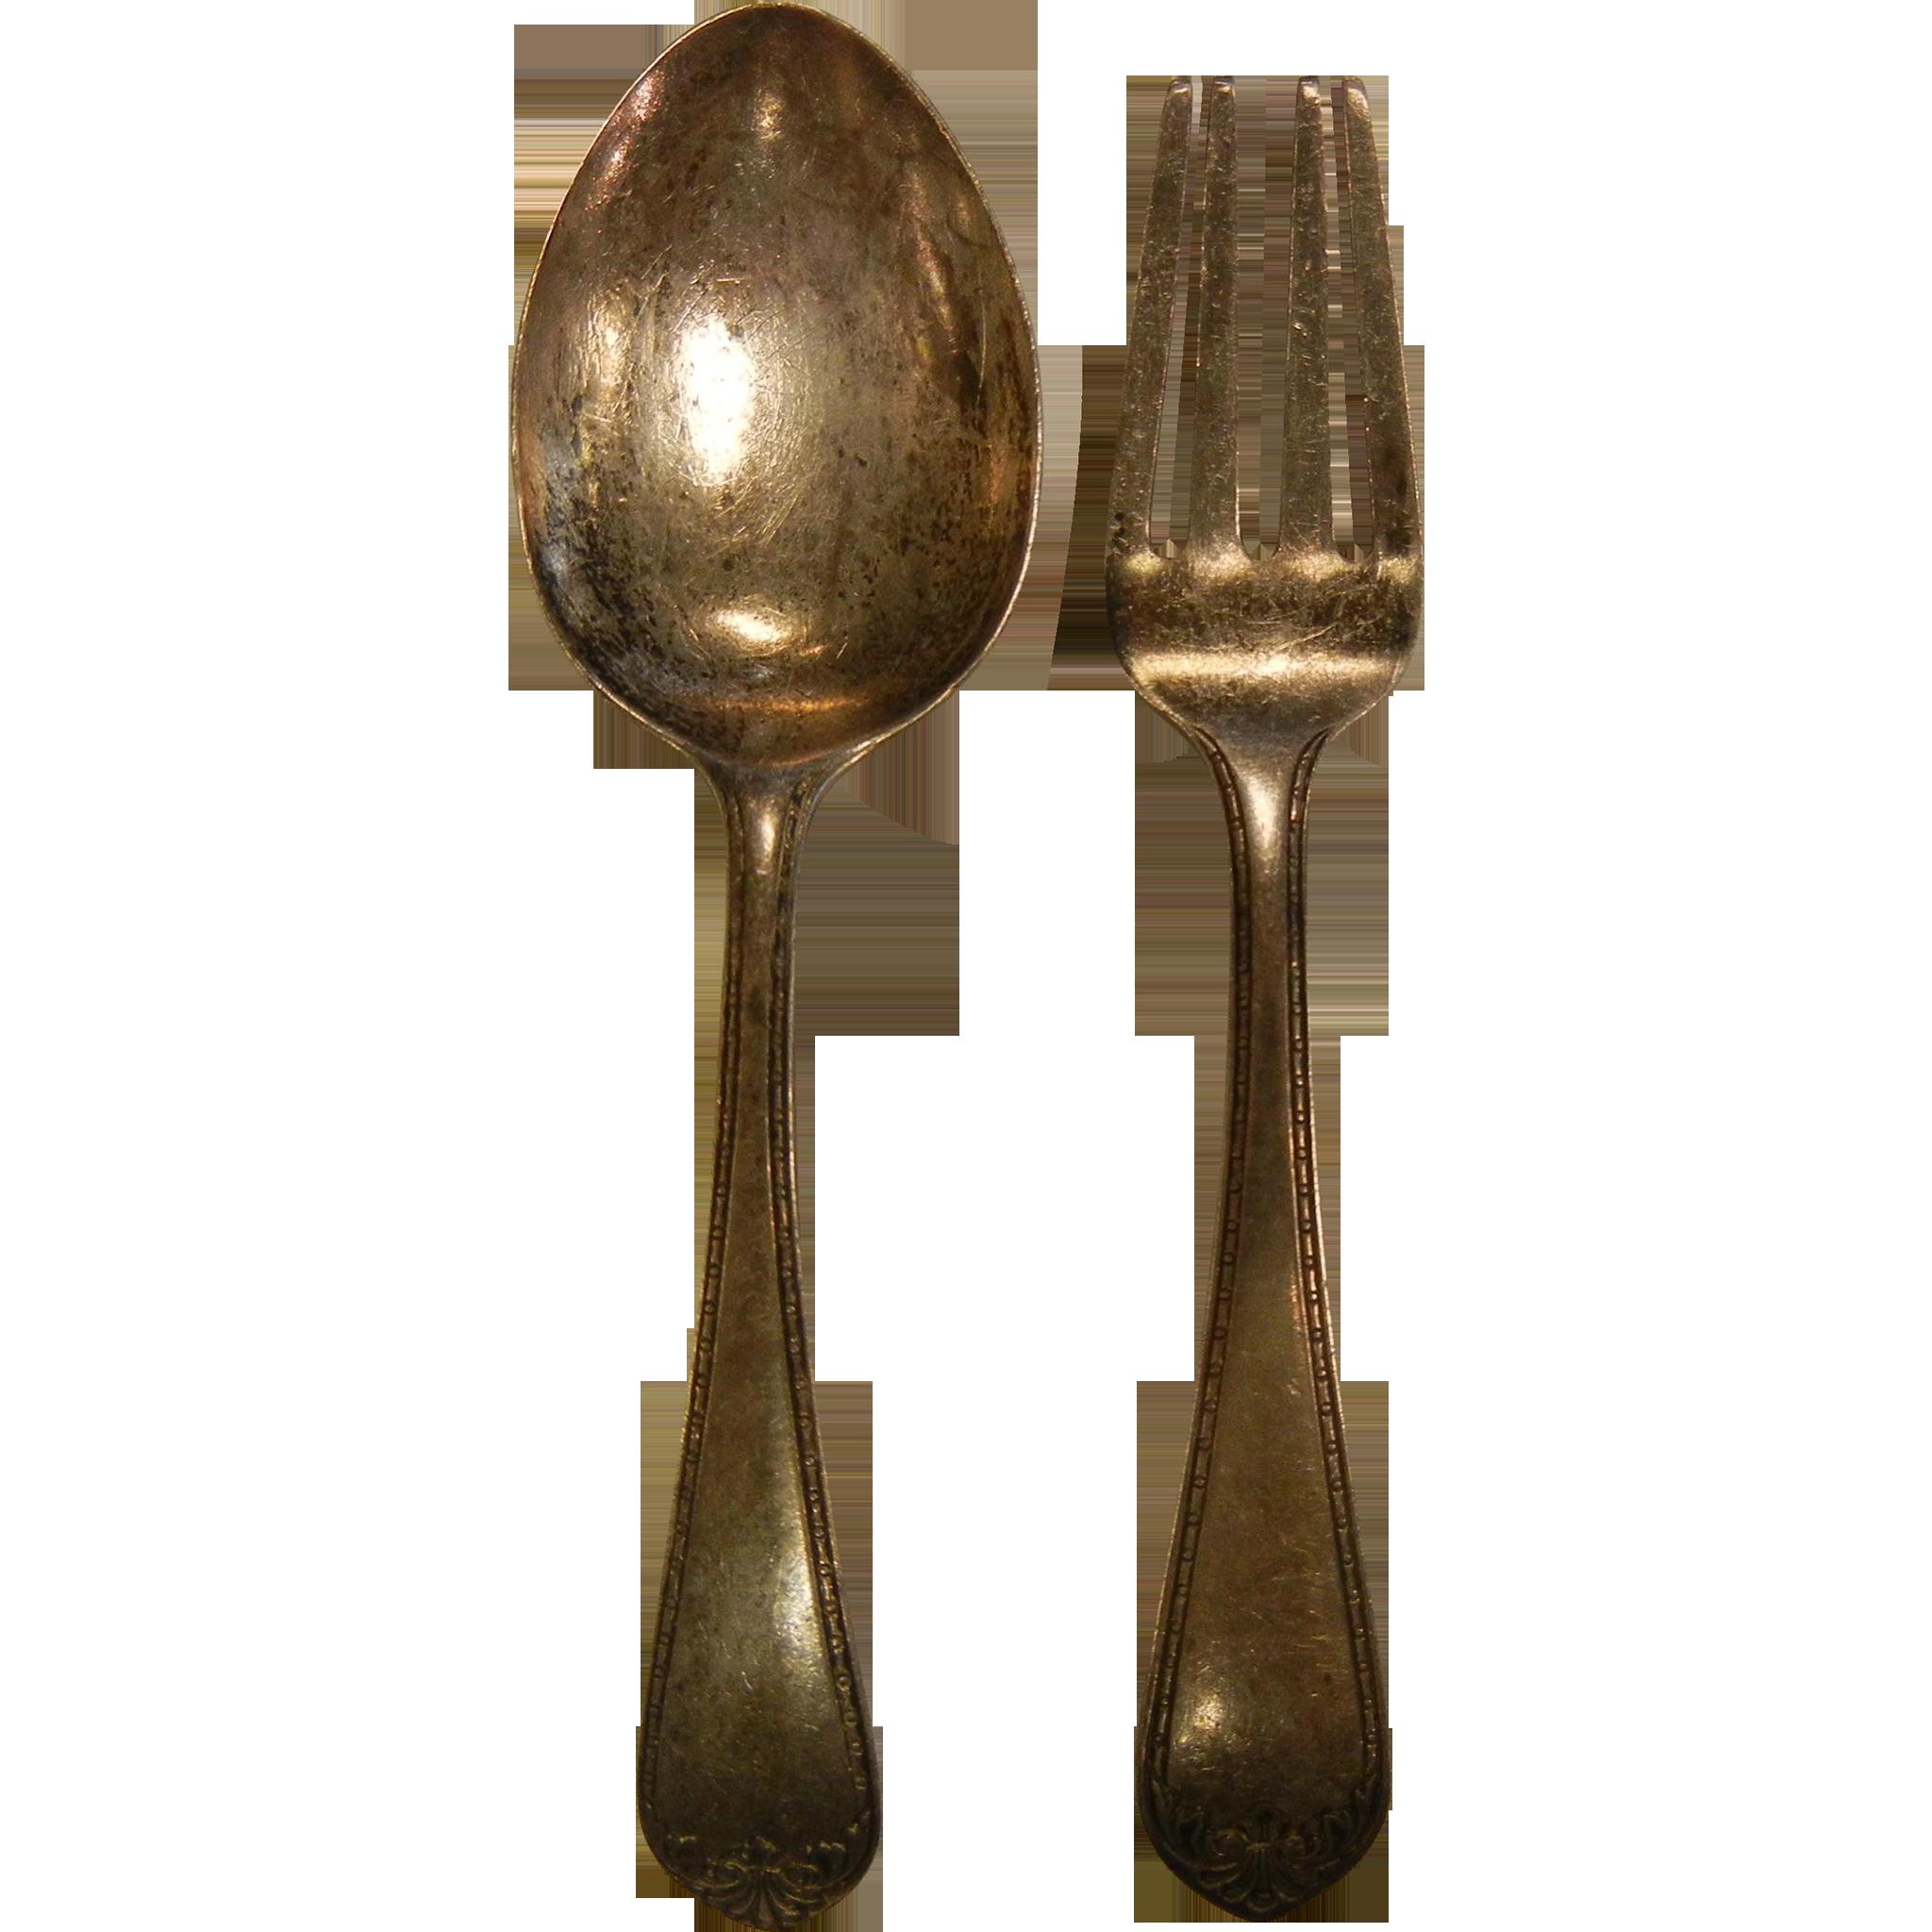 Vintage Sterling Silver Child's 'Treasure' Fork & Spoon Set